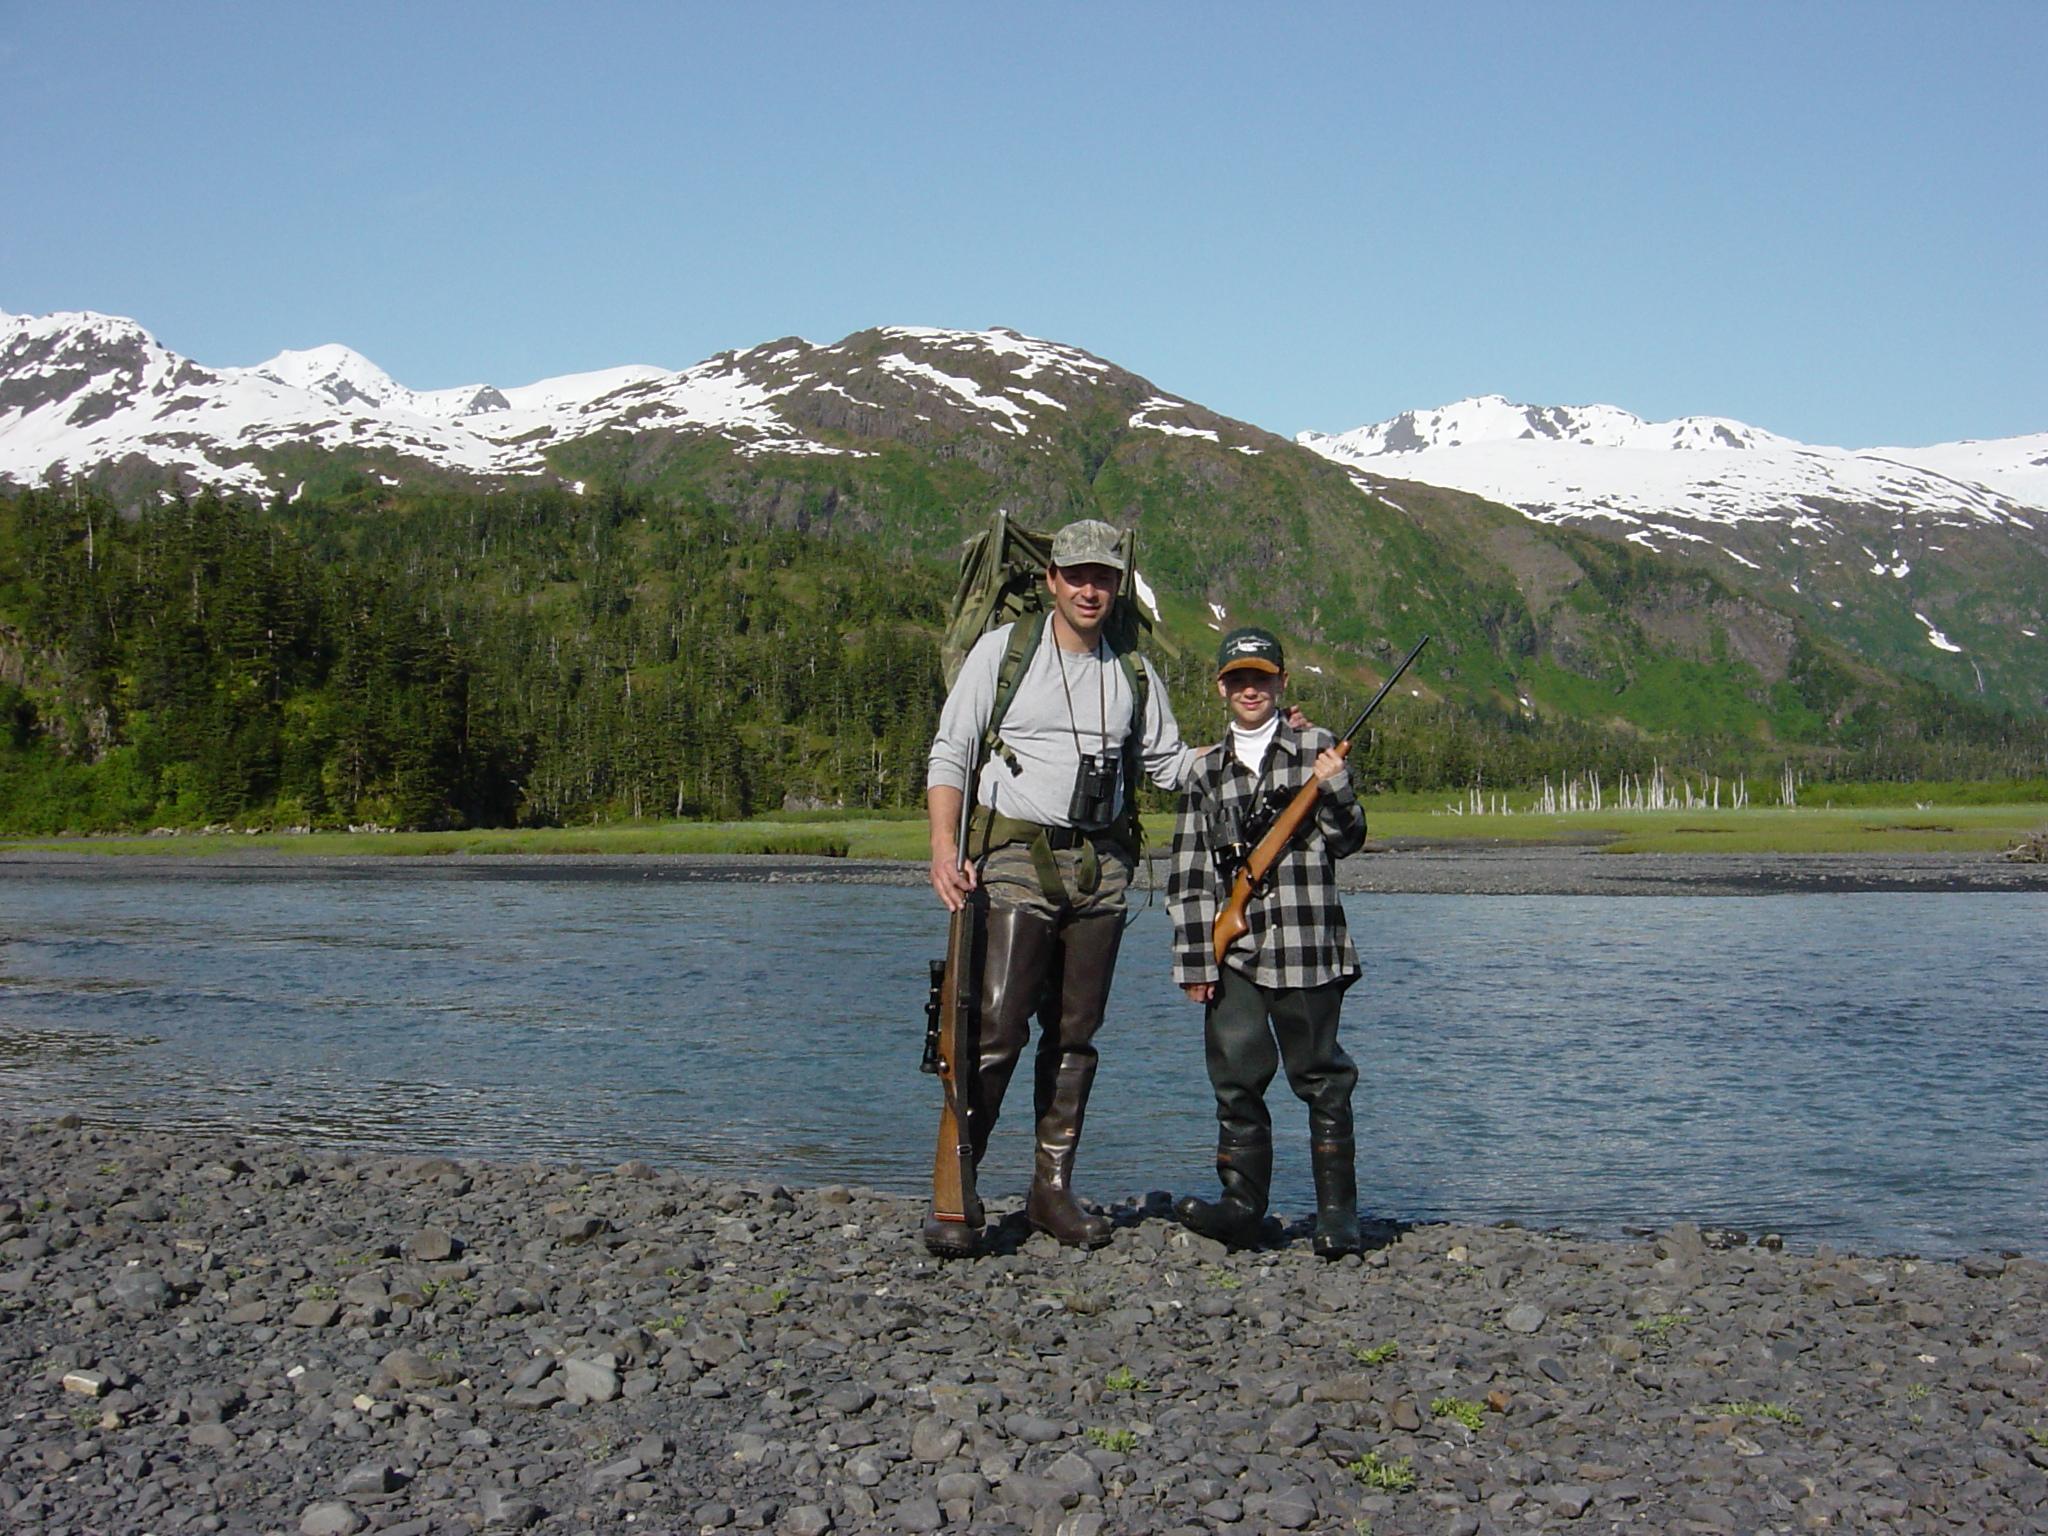 Jordan with her dad Sagen Juliussen on one of those beautiful Prince William Sound days.